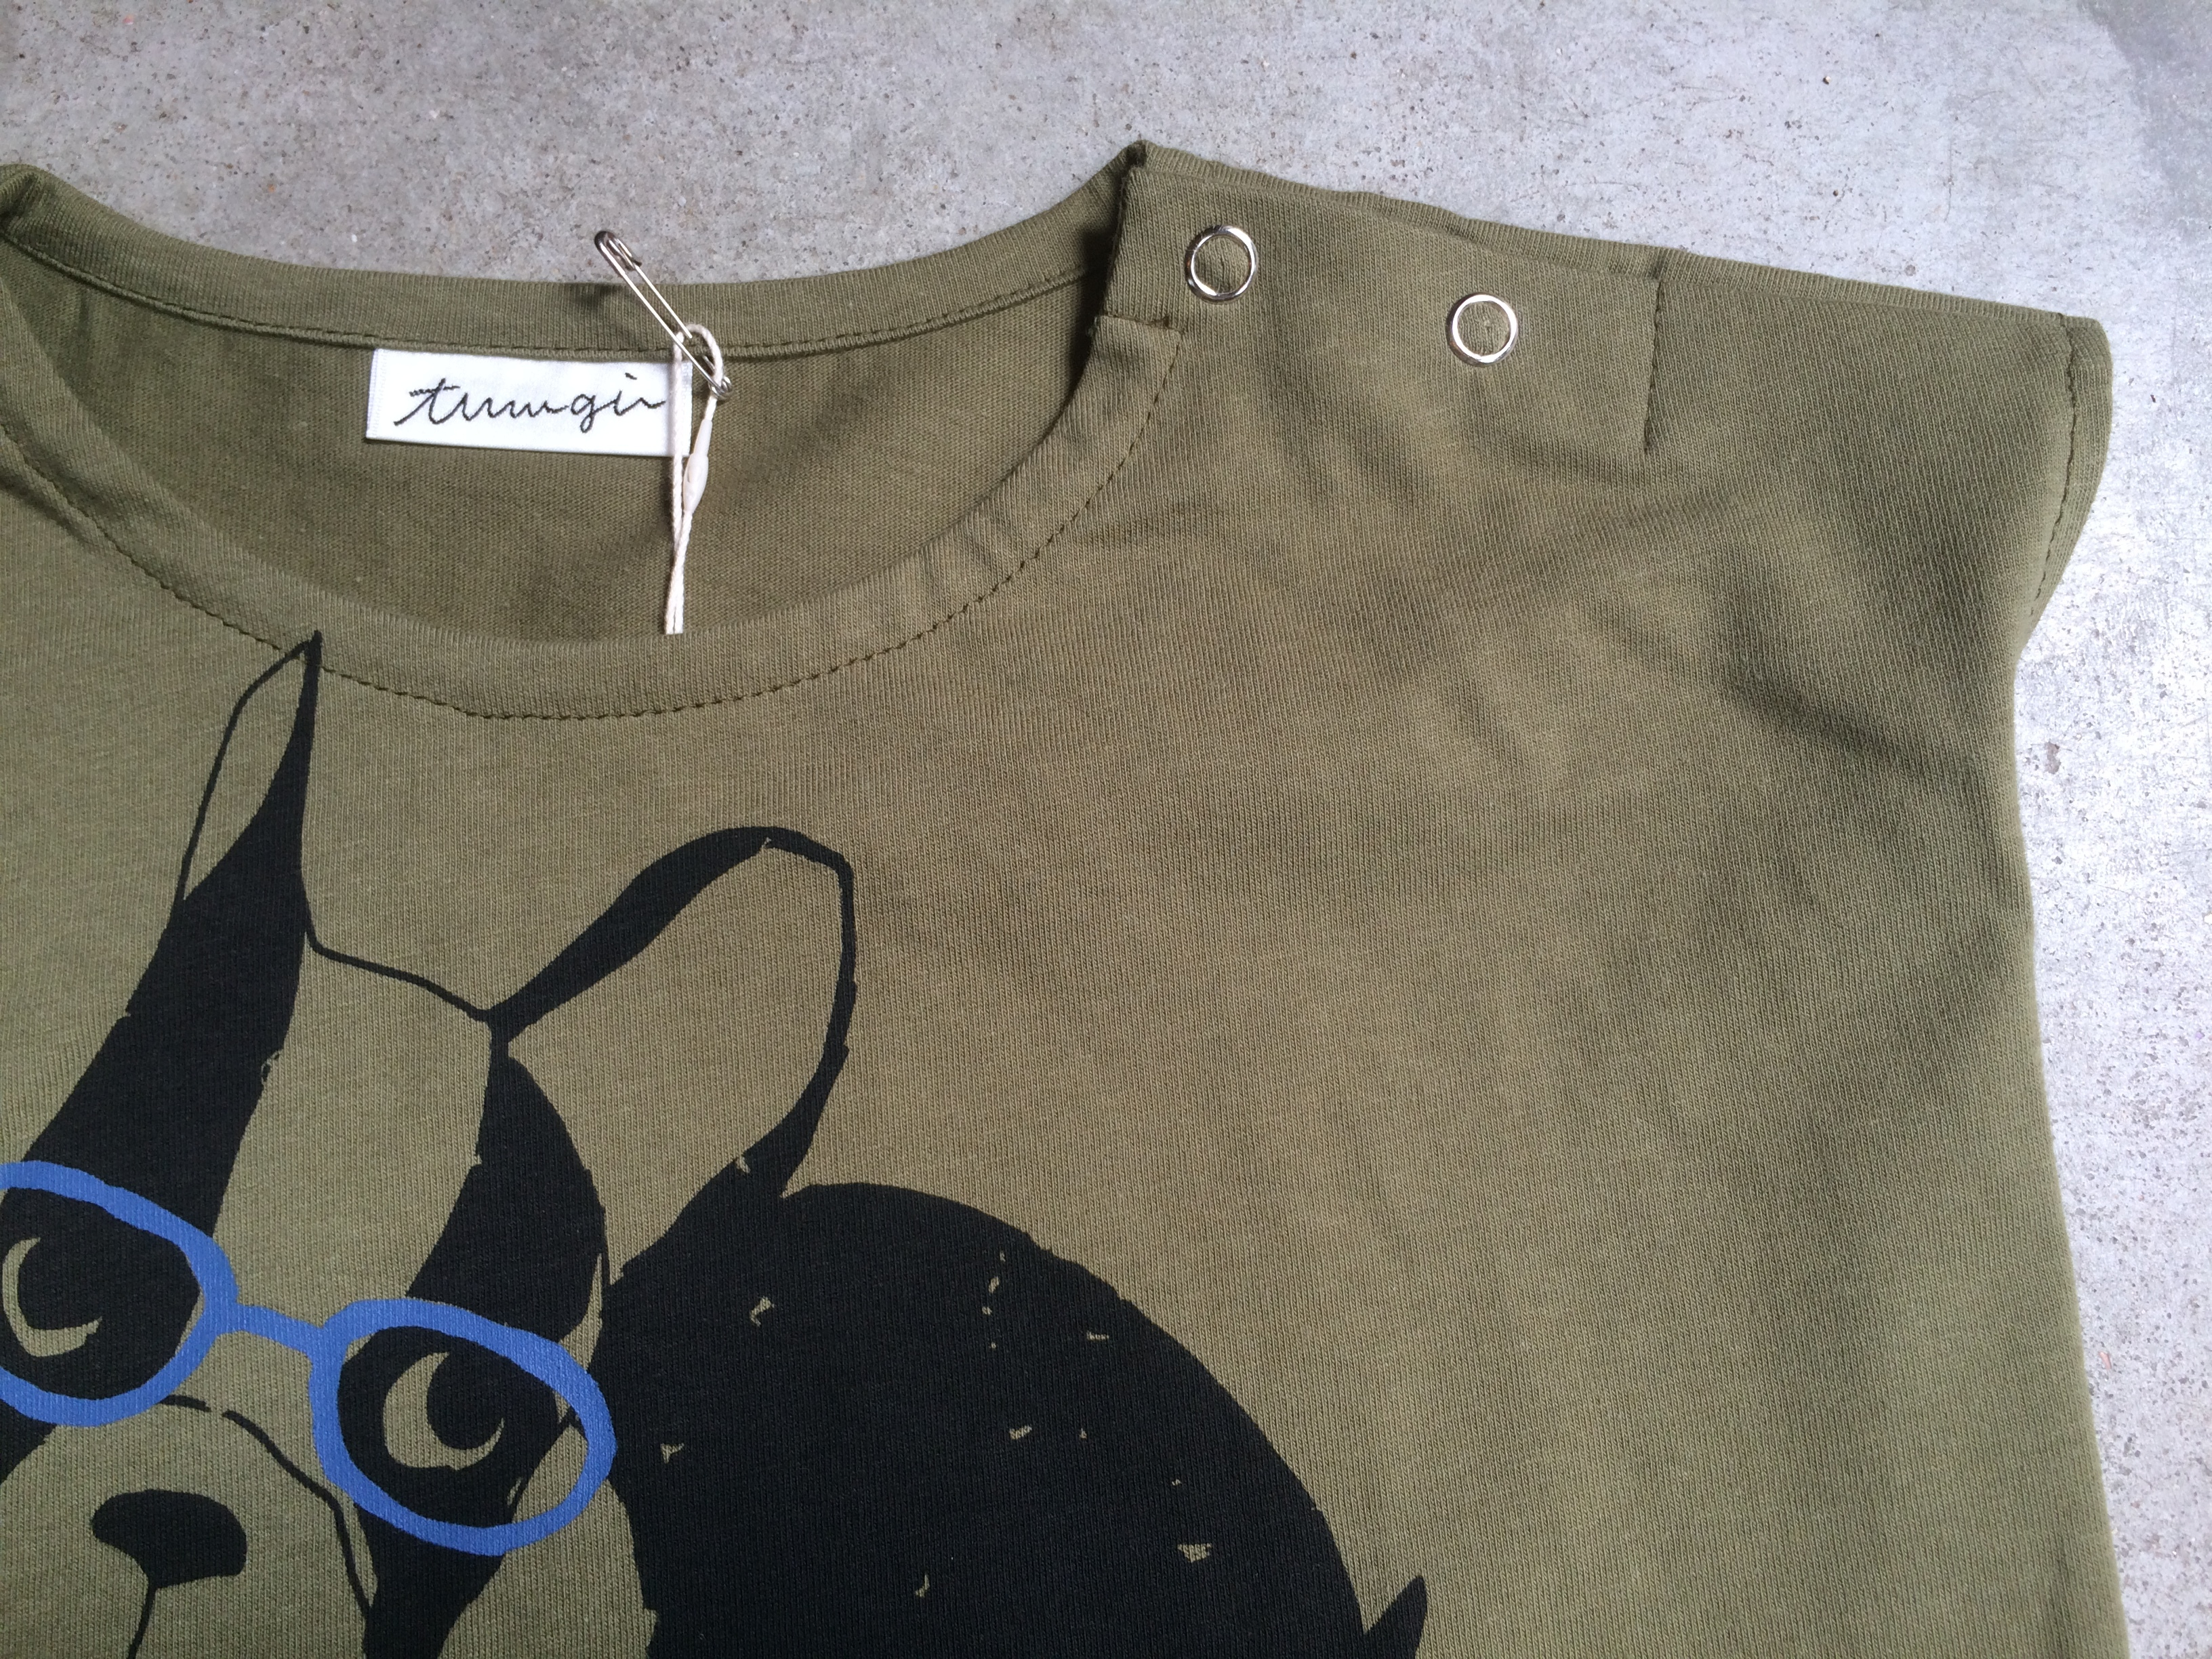 tumugi フレンチブルドックTシャツ130 カーキ